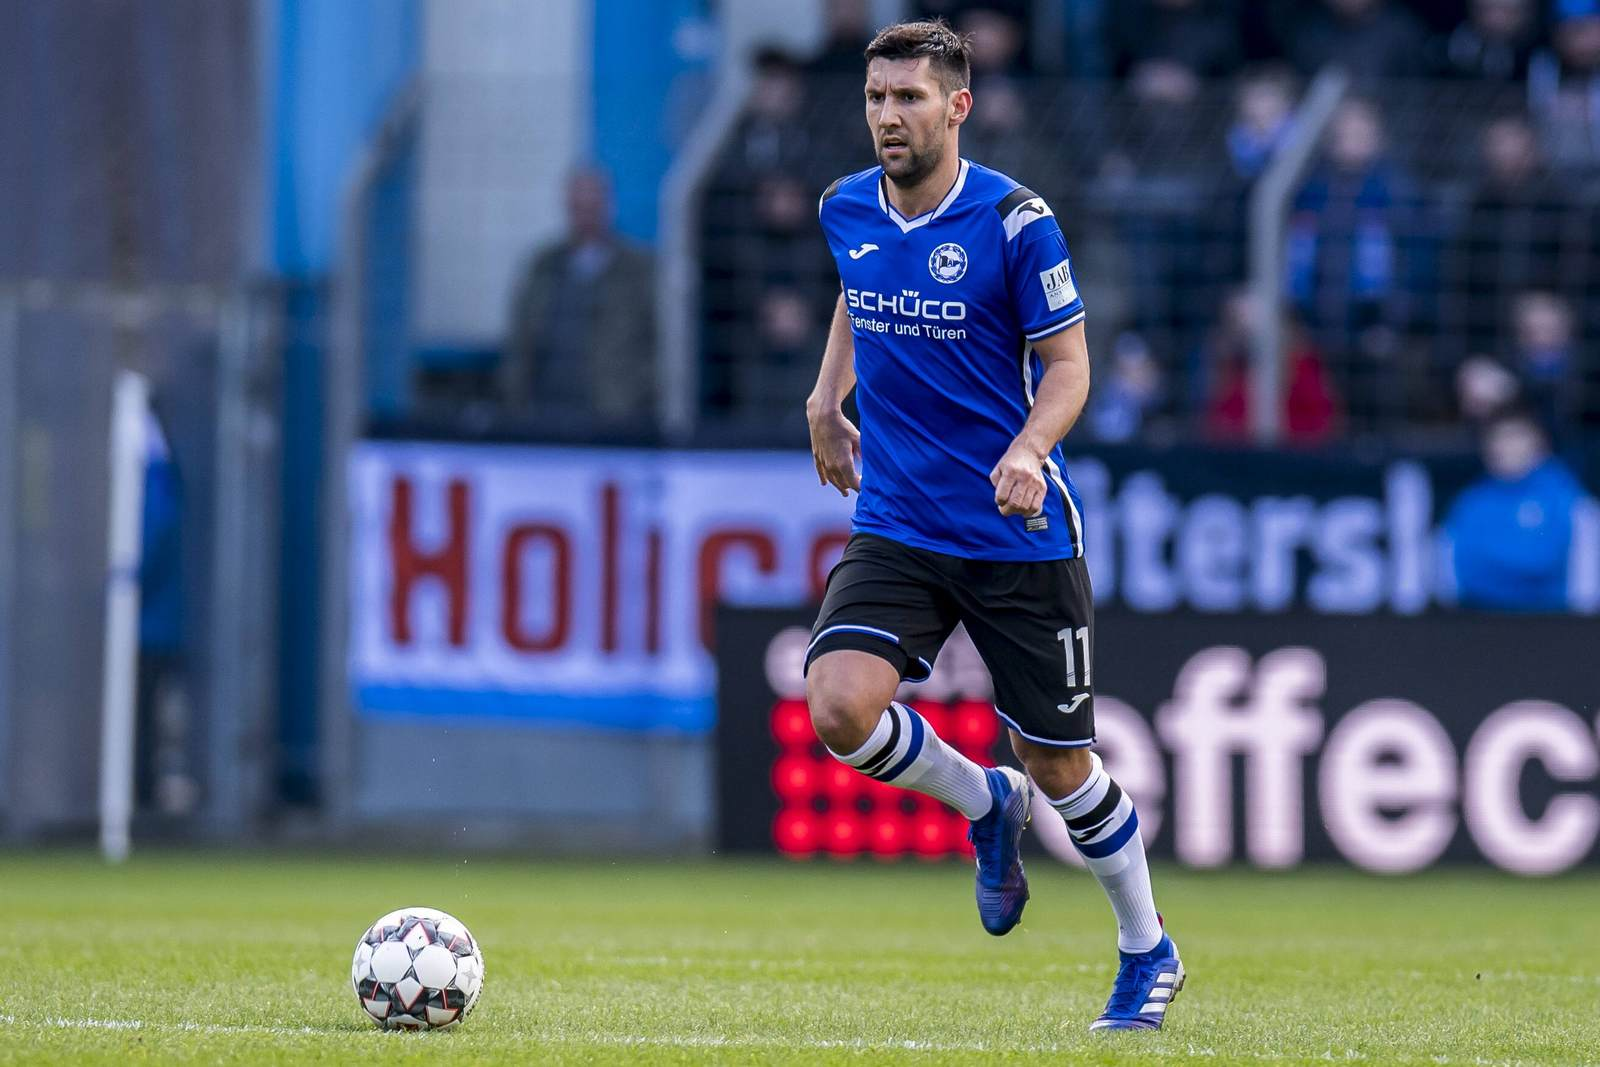 Stephan Salger bei Arminia Bielefeld